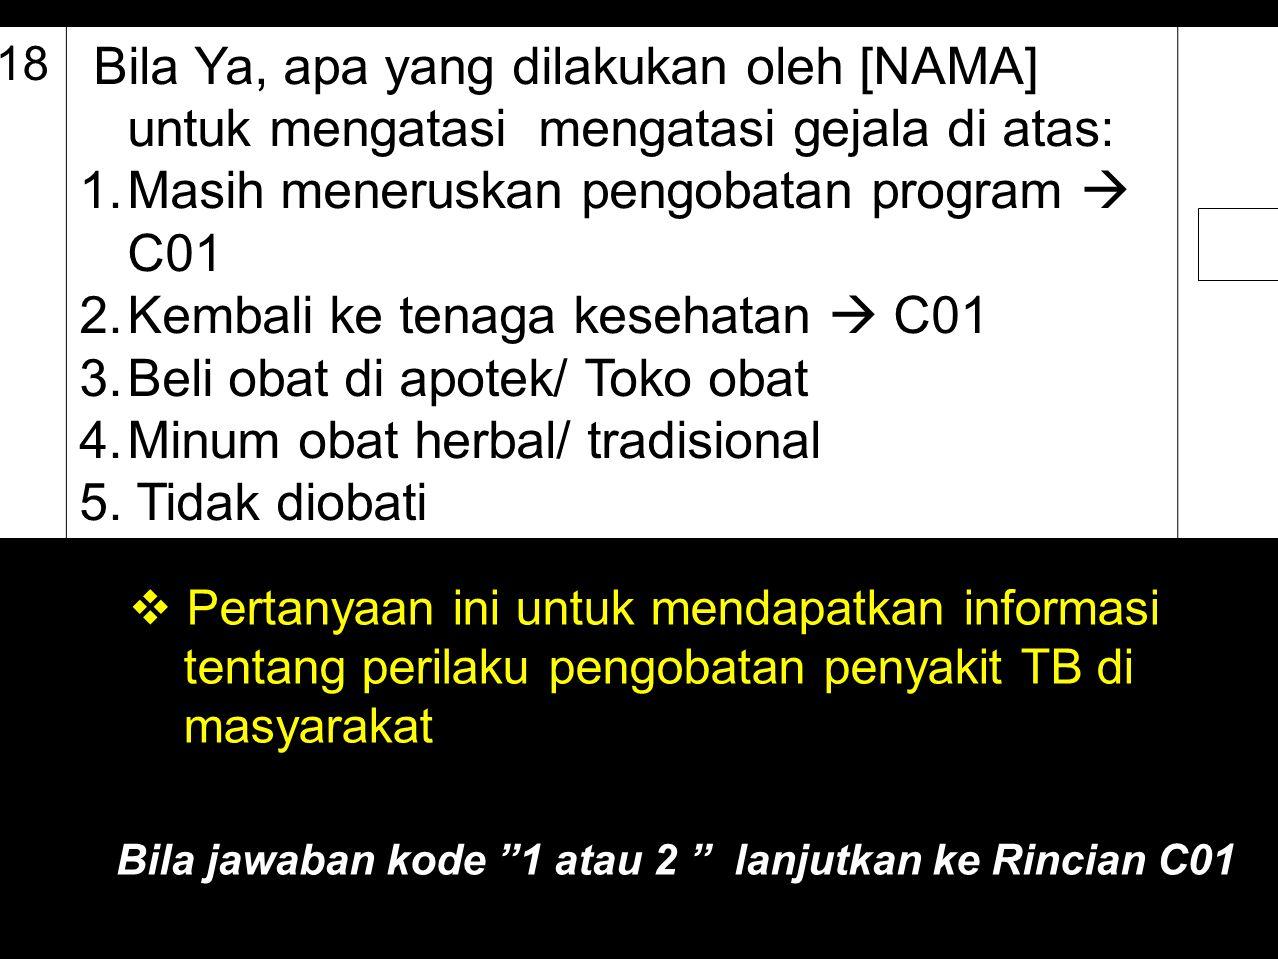 B.18 Bila Ya, apa yang dilakukan oleh [NAMA] untuk mengatasi mengatasi gejala di atas: 1.Masih meneruskan pengobatan program  C01 2.Kembali ke tenaga